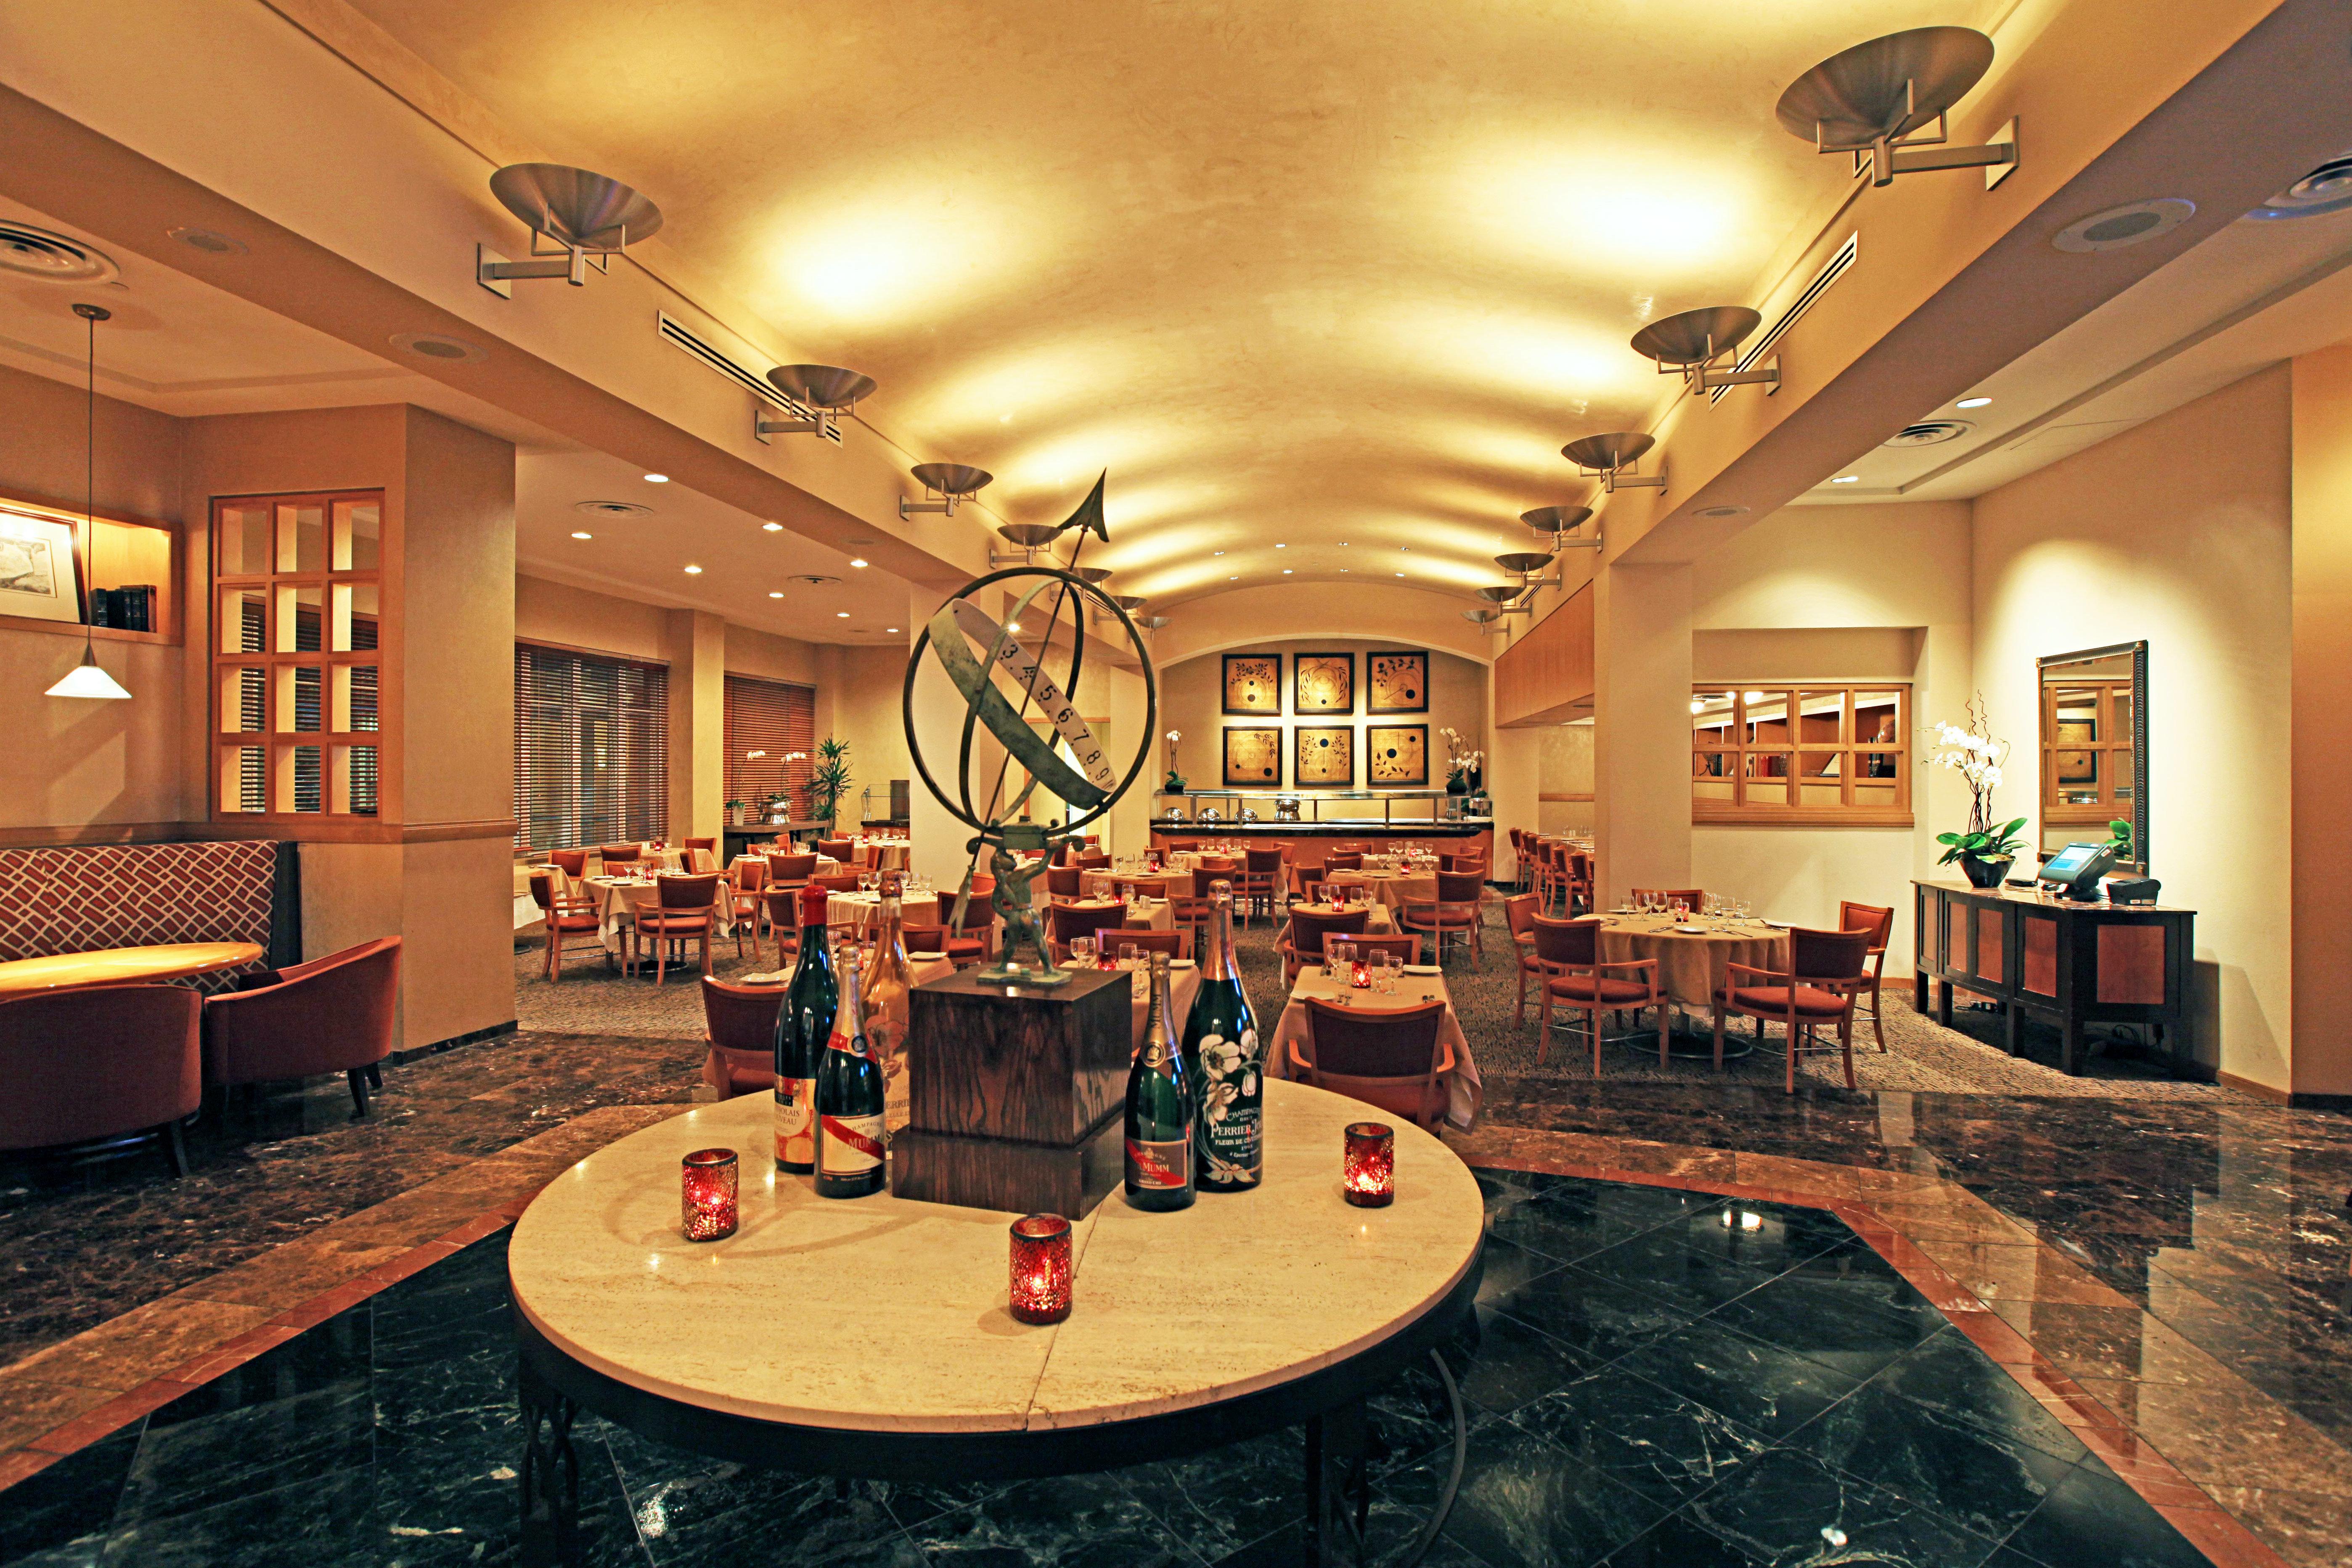 Classic Dining Drink Eat Resort Lobby building recreation room function hall mansion ballroom Island